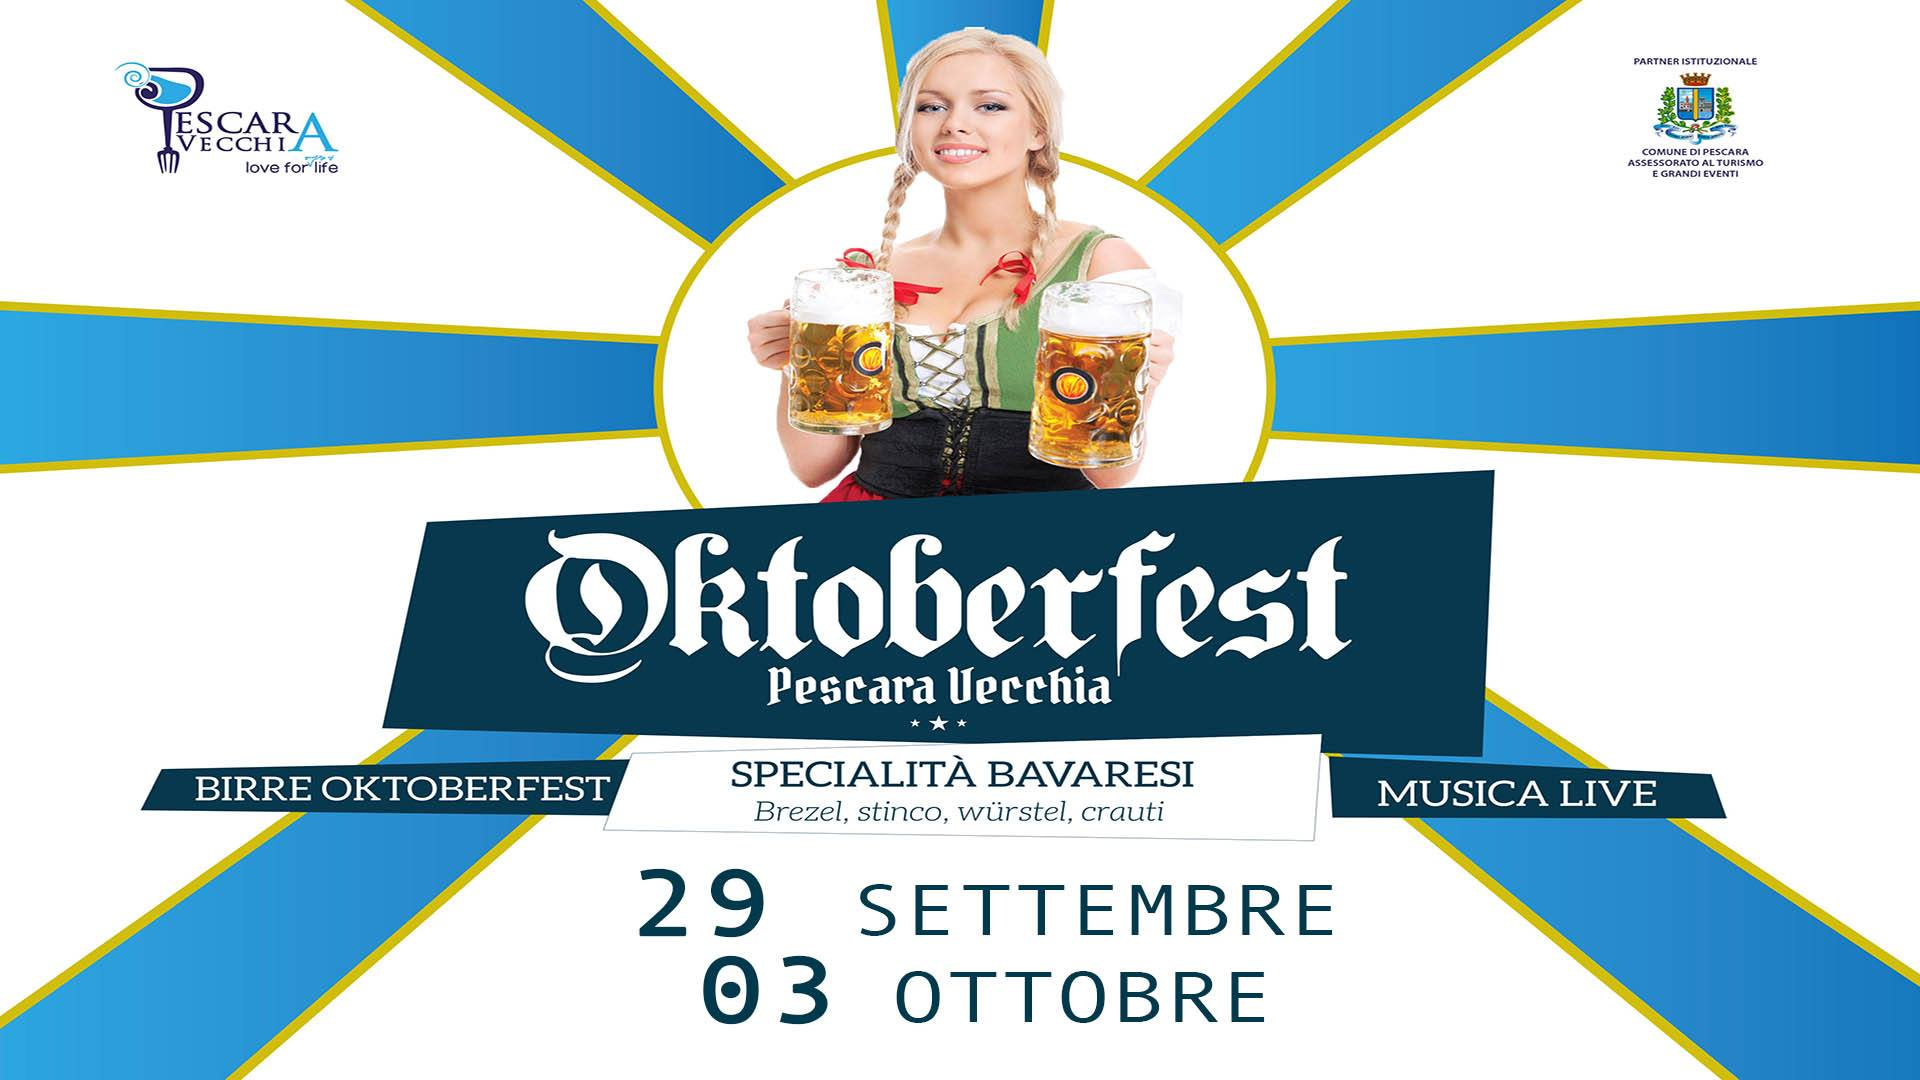 L'Oktober Fest di Pescara Vecchia